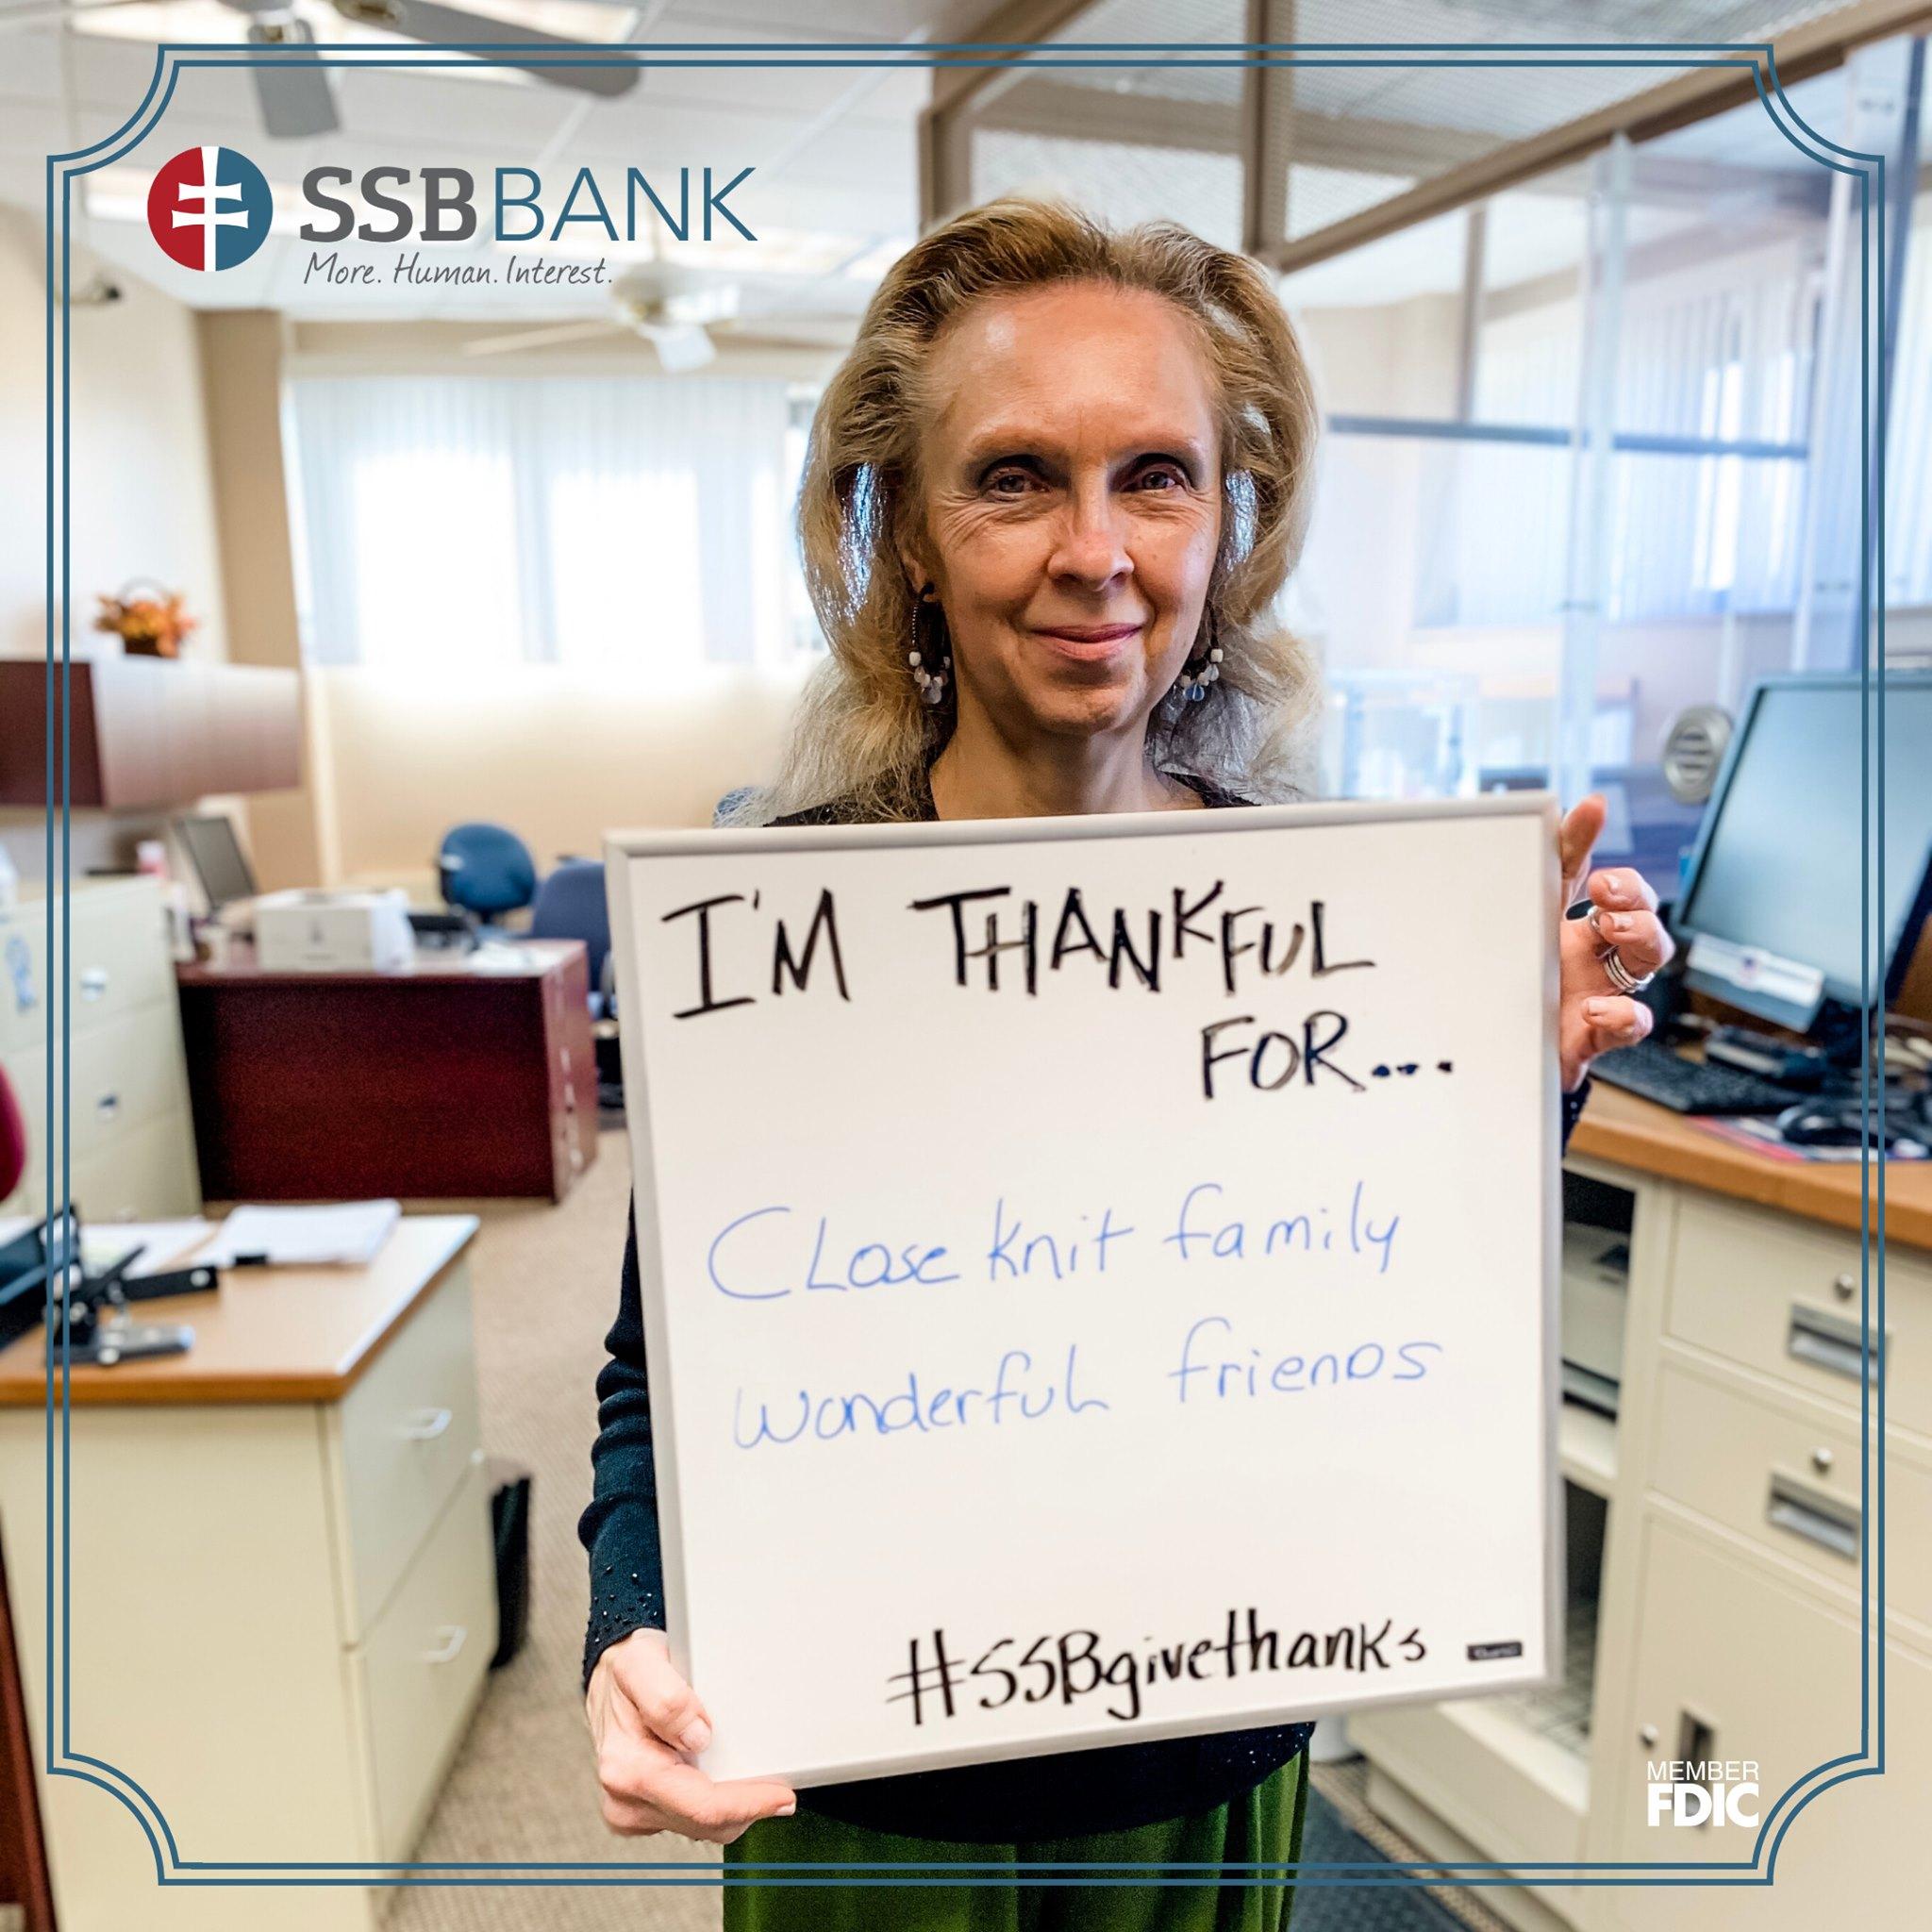 ssb bank pittsburgh employee